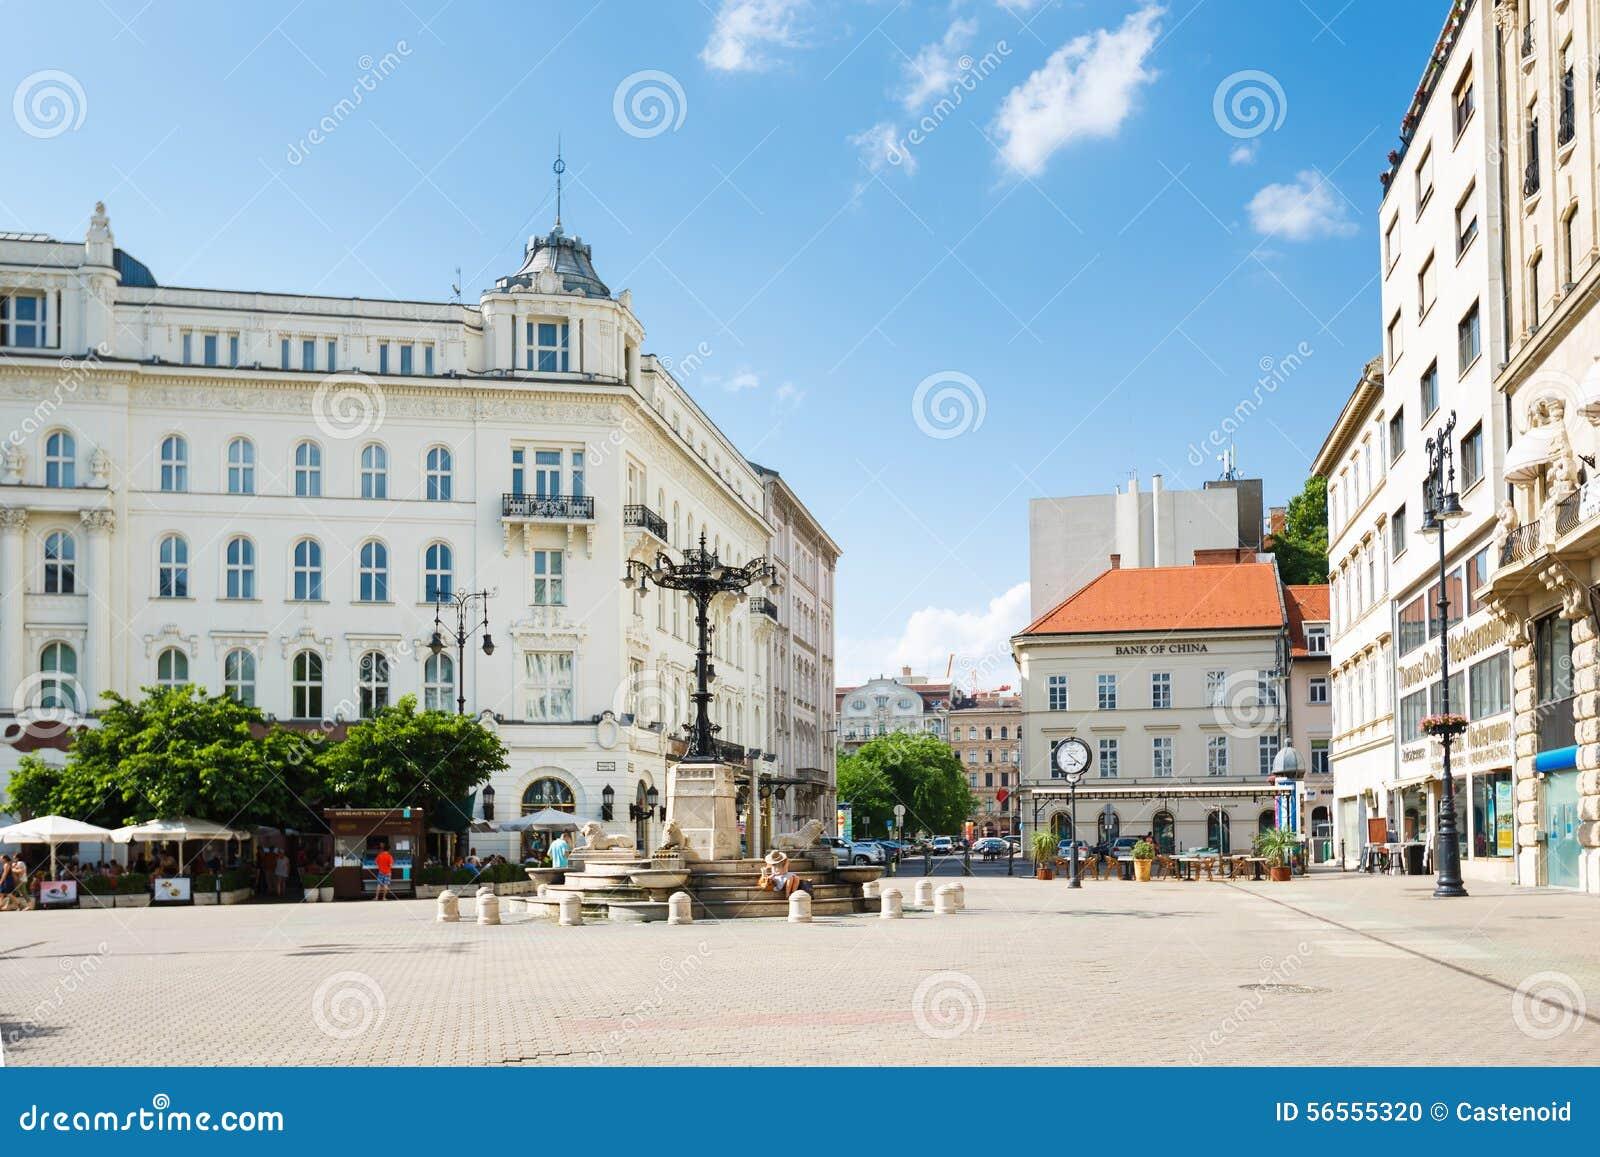 Download Τετράγωνο Vorosmarty, Βουδαπέστη Εκδοτική εικόνα - εικόνα από άνθρωποι, αρχιτεκτονικής: 56555320